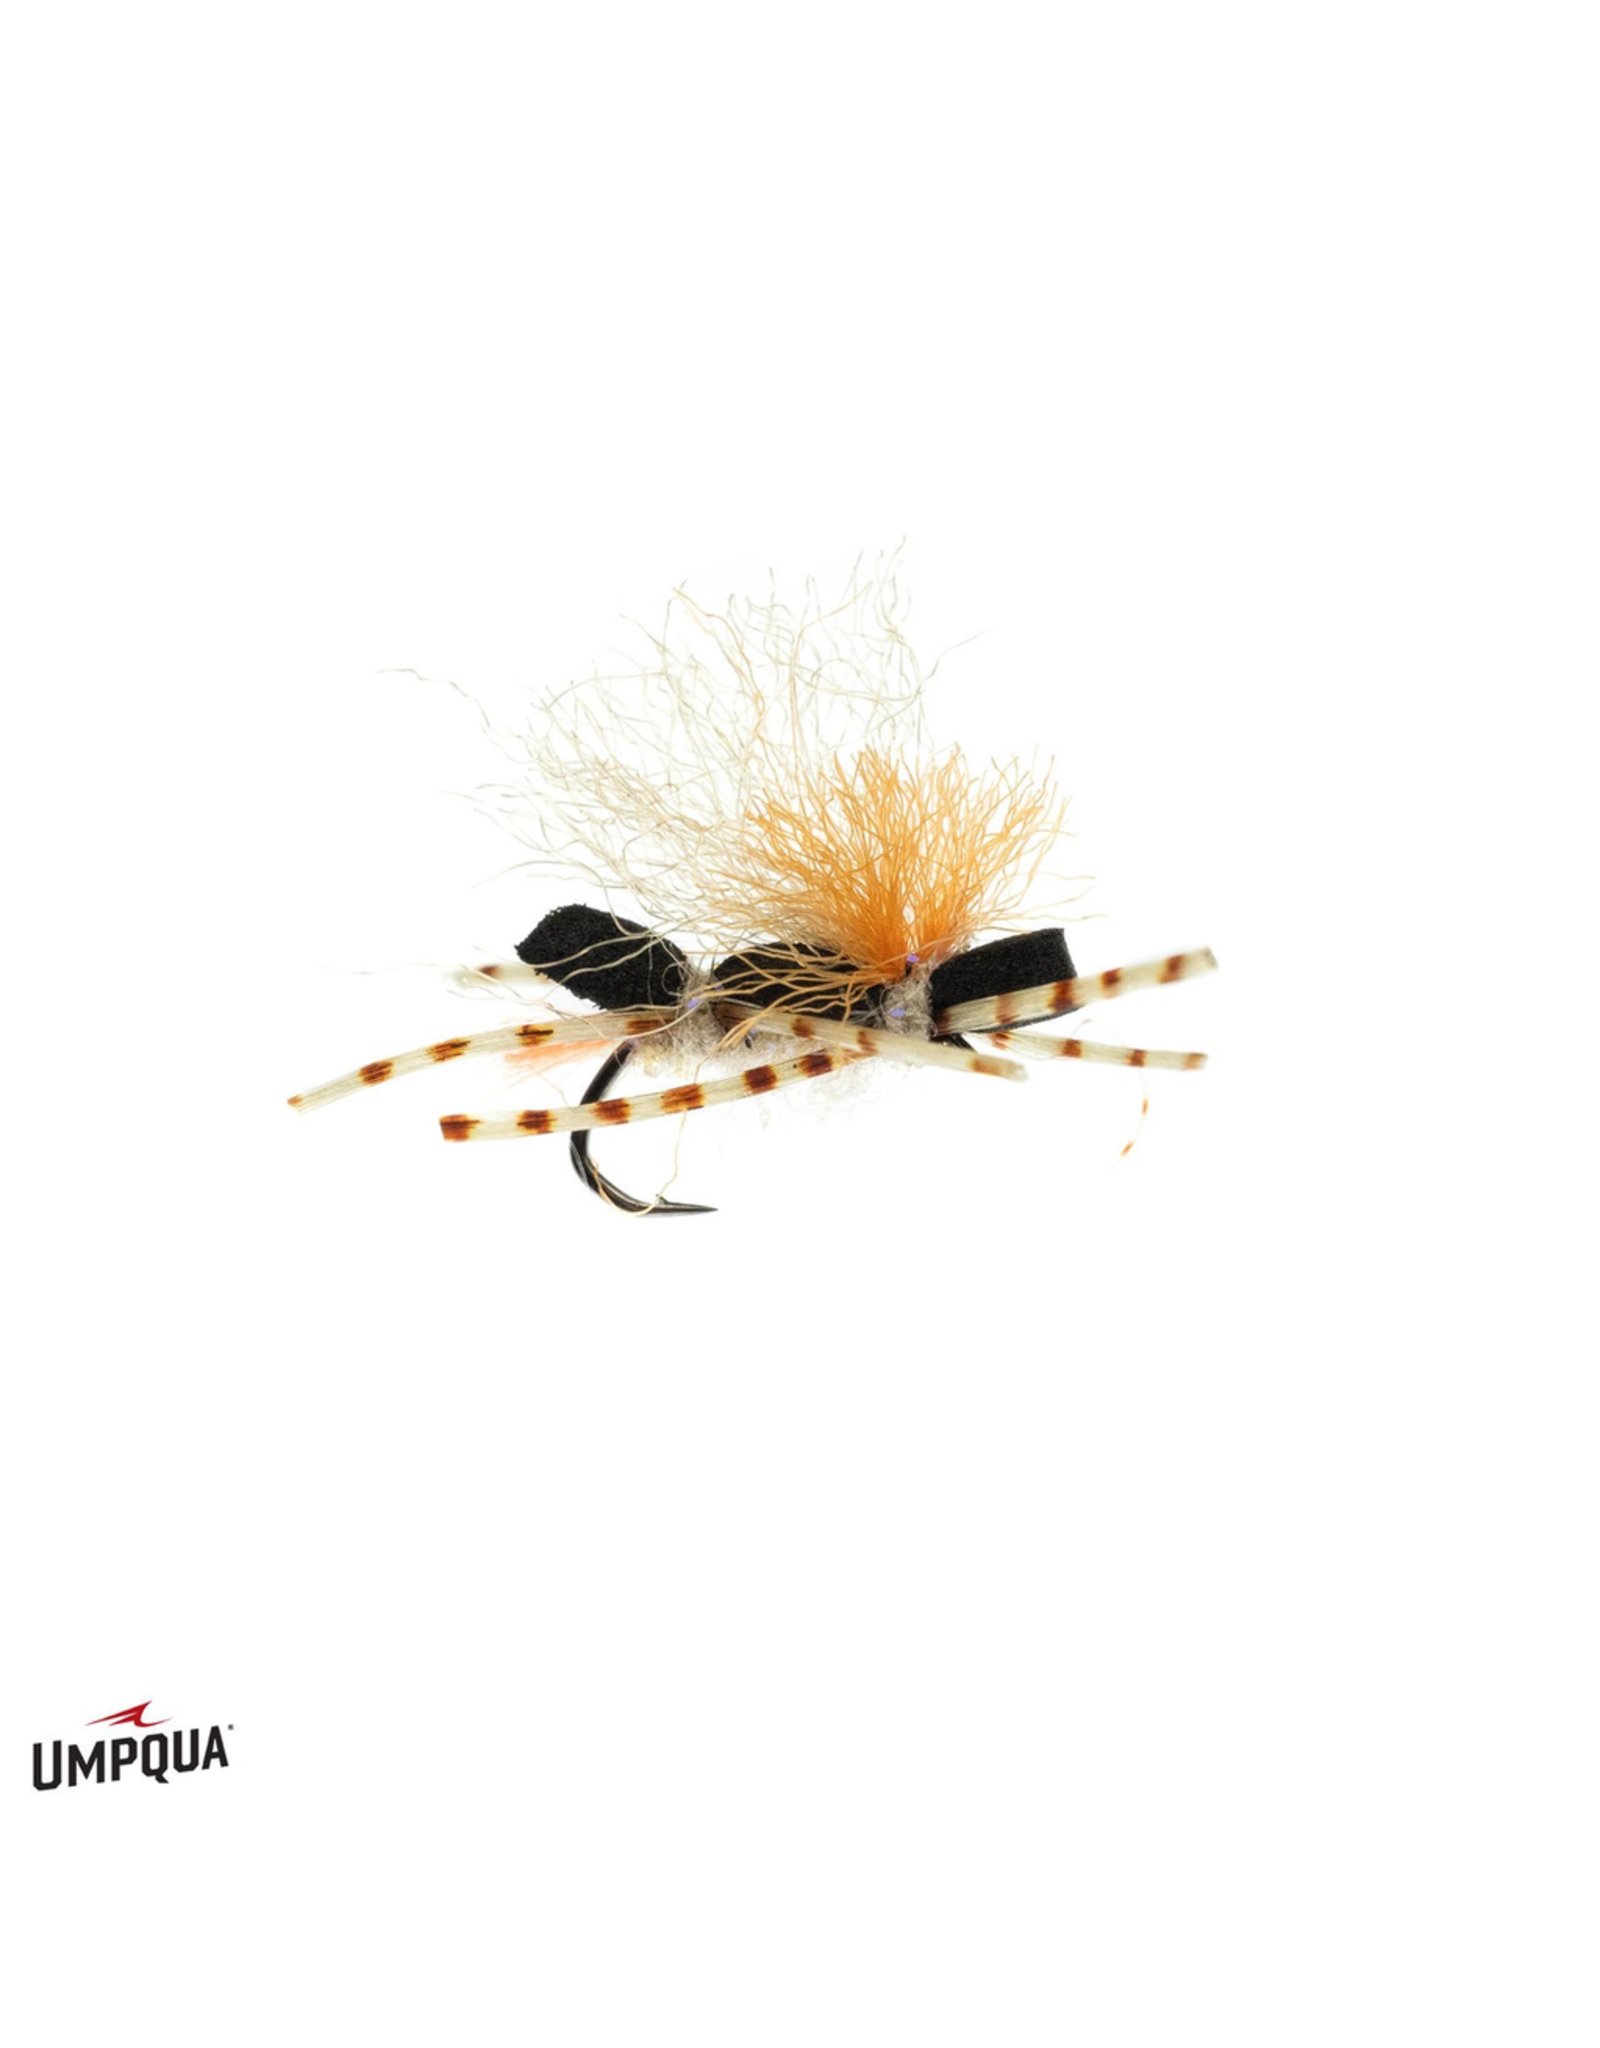 Umpqua Stubby Chubby (3 Pack)